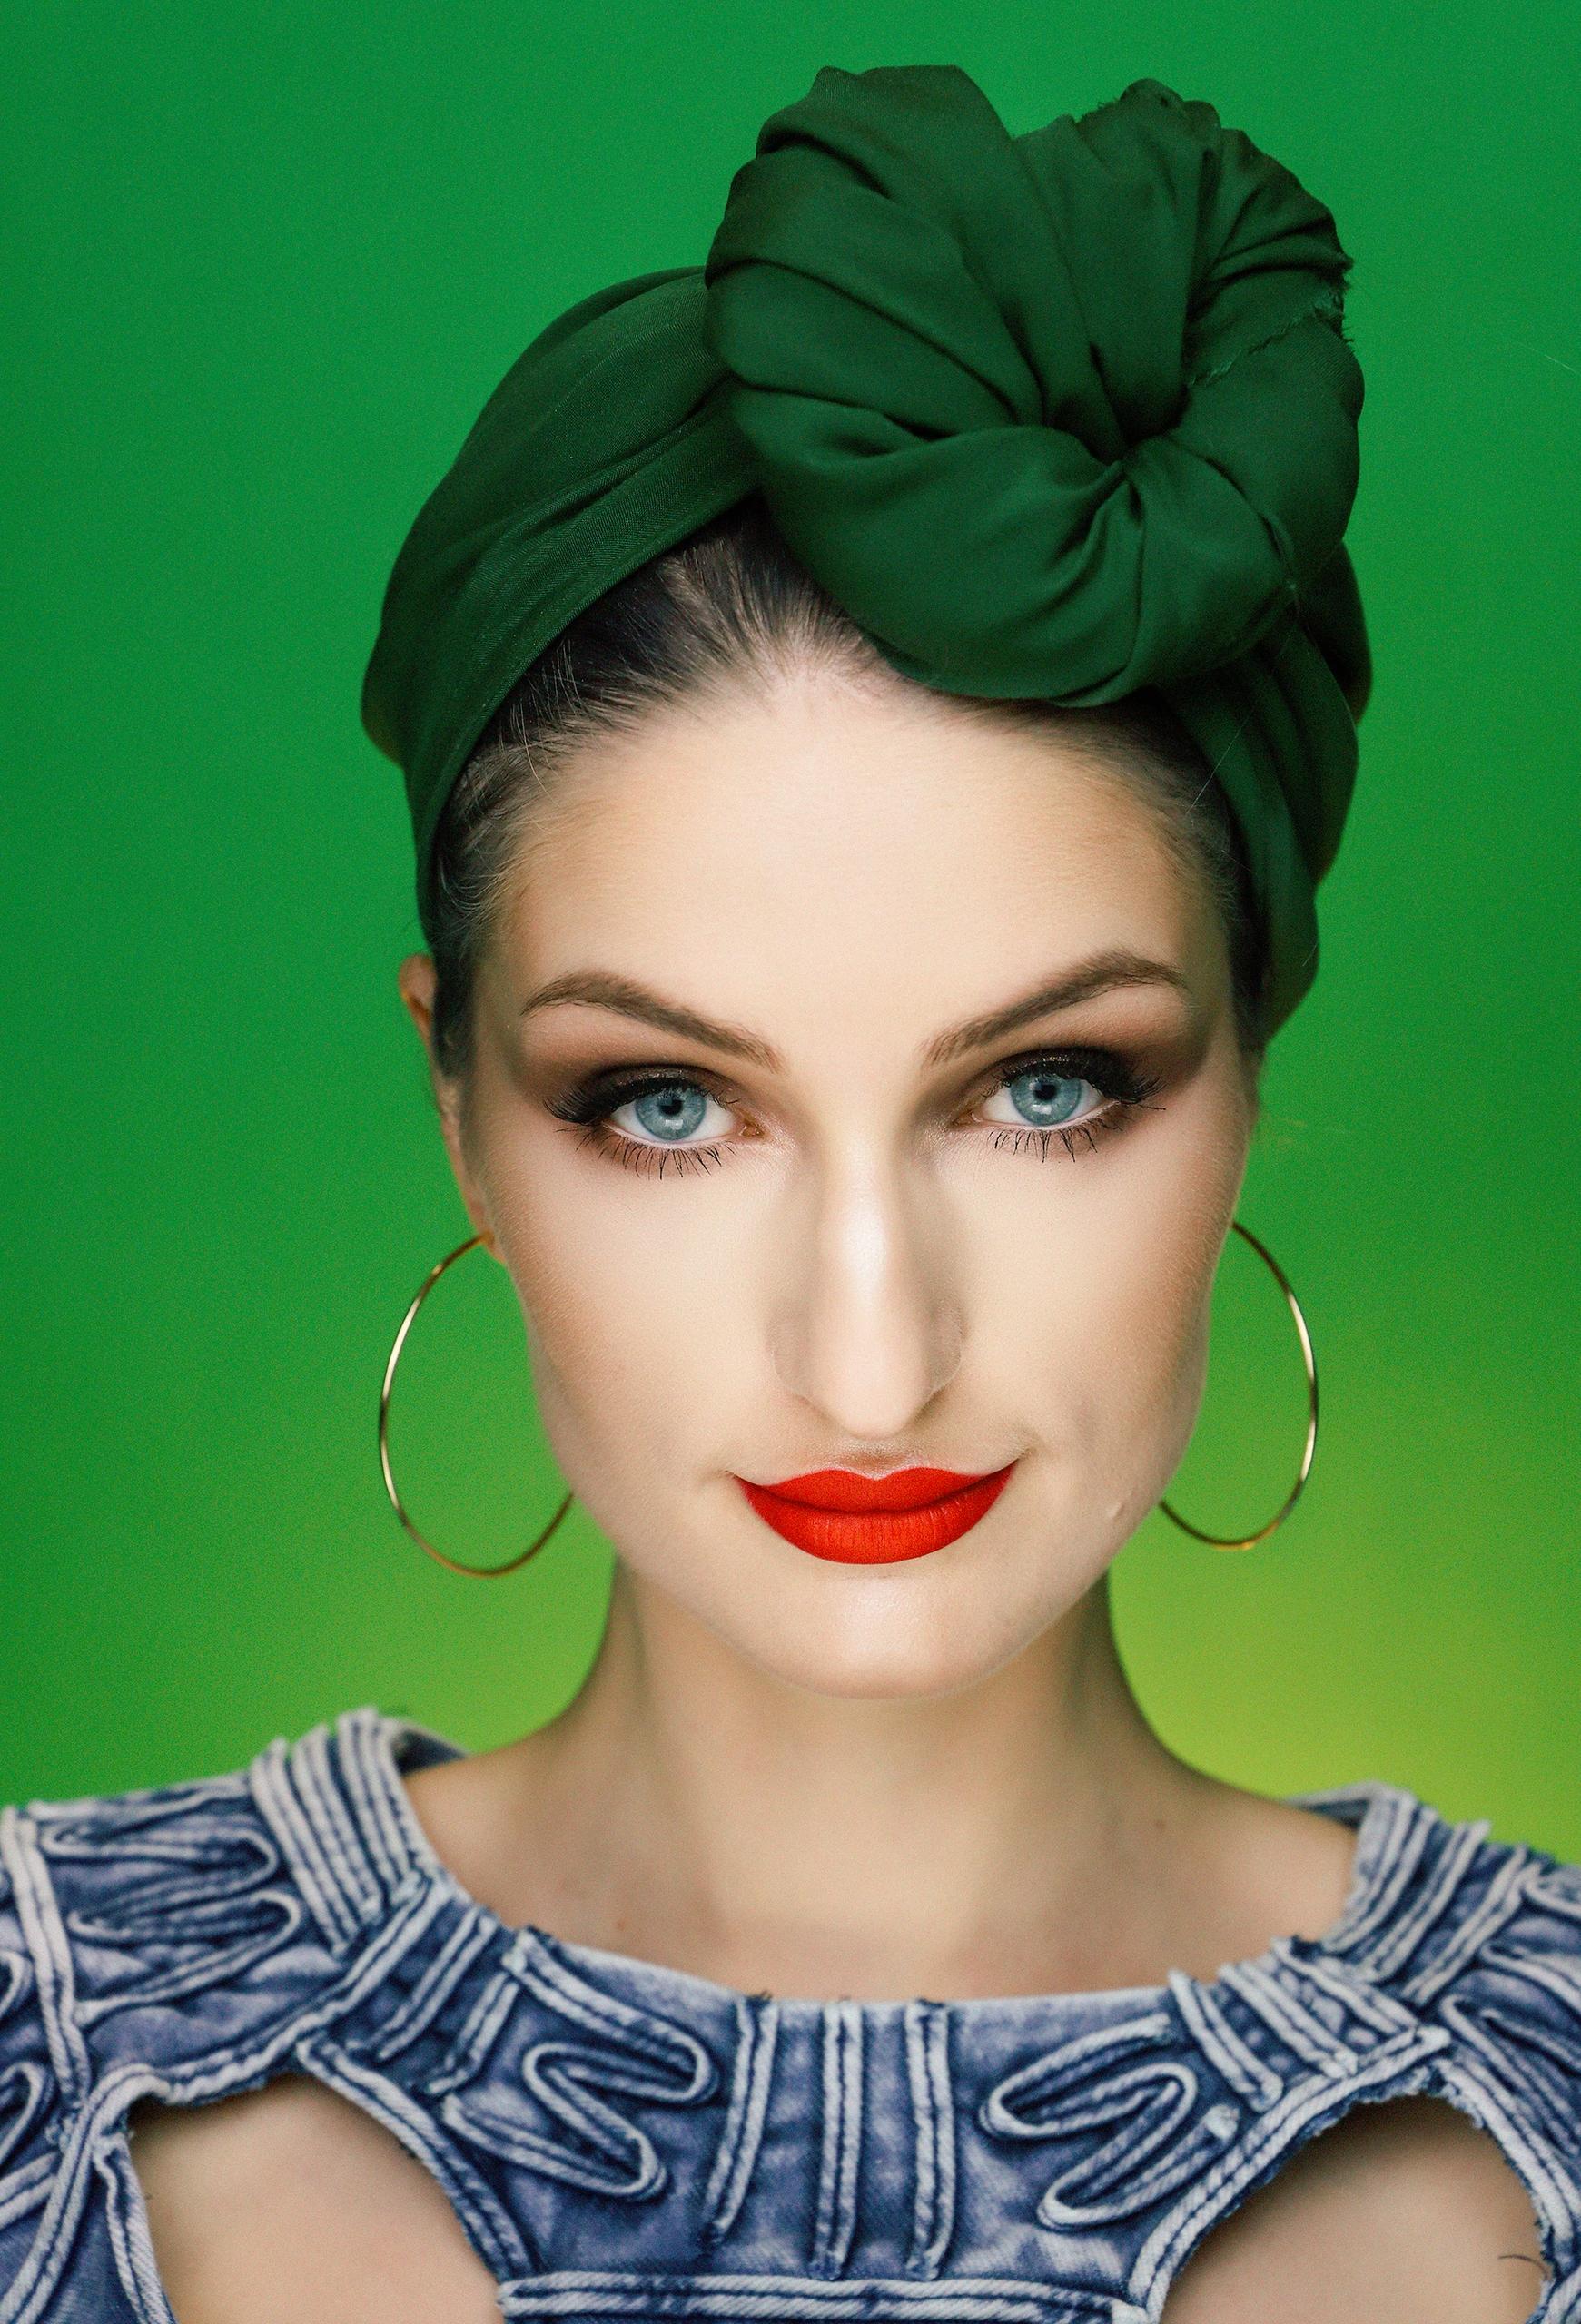 Make-up inspirowany obrazem 'Zielony turban' by Tamara Łempicka